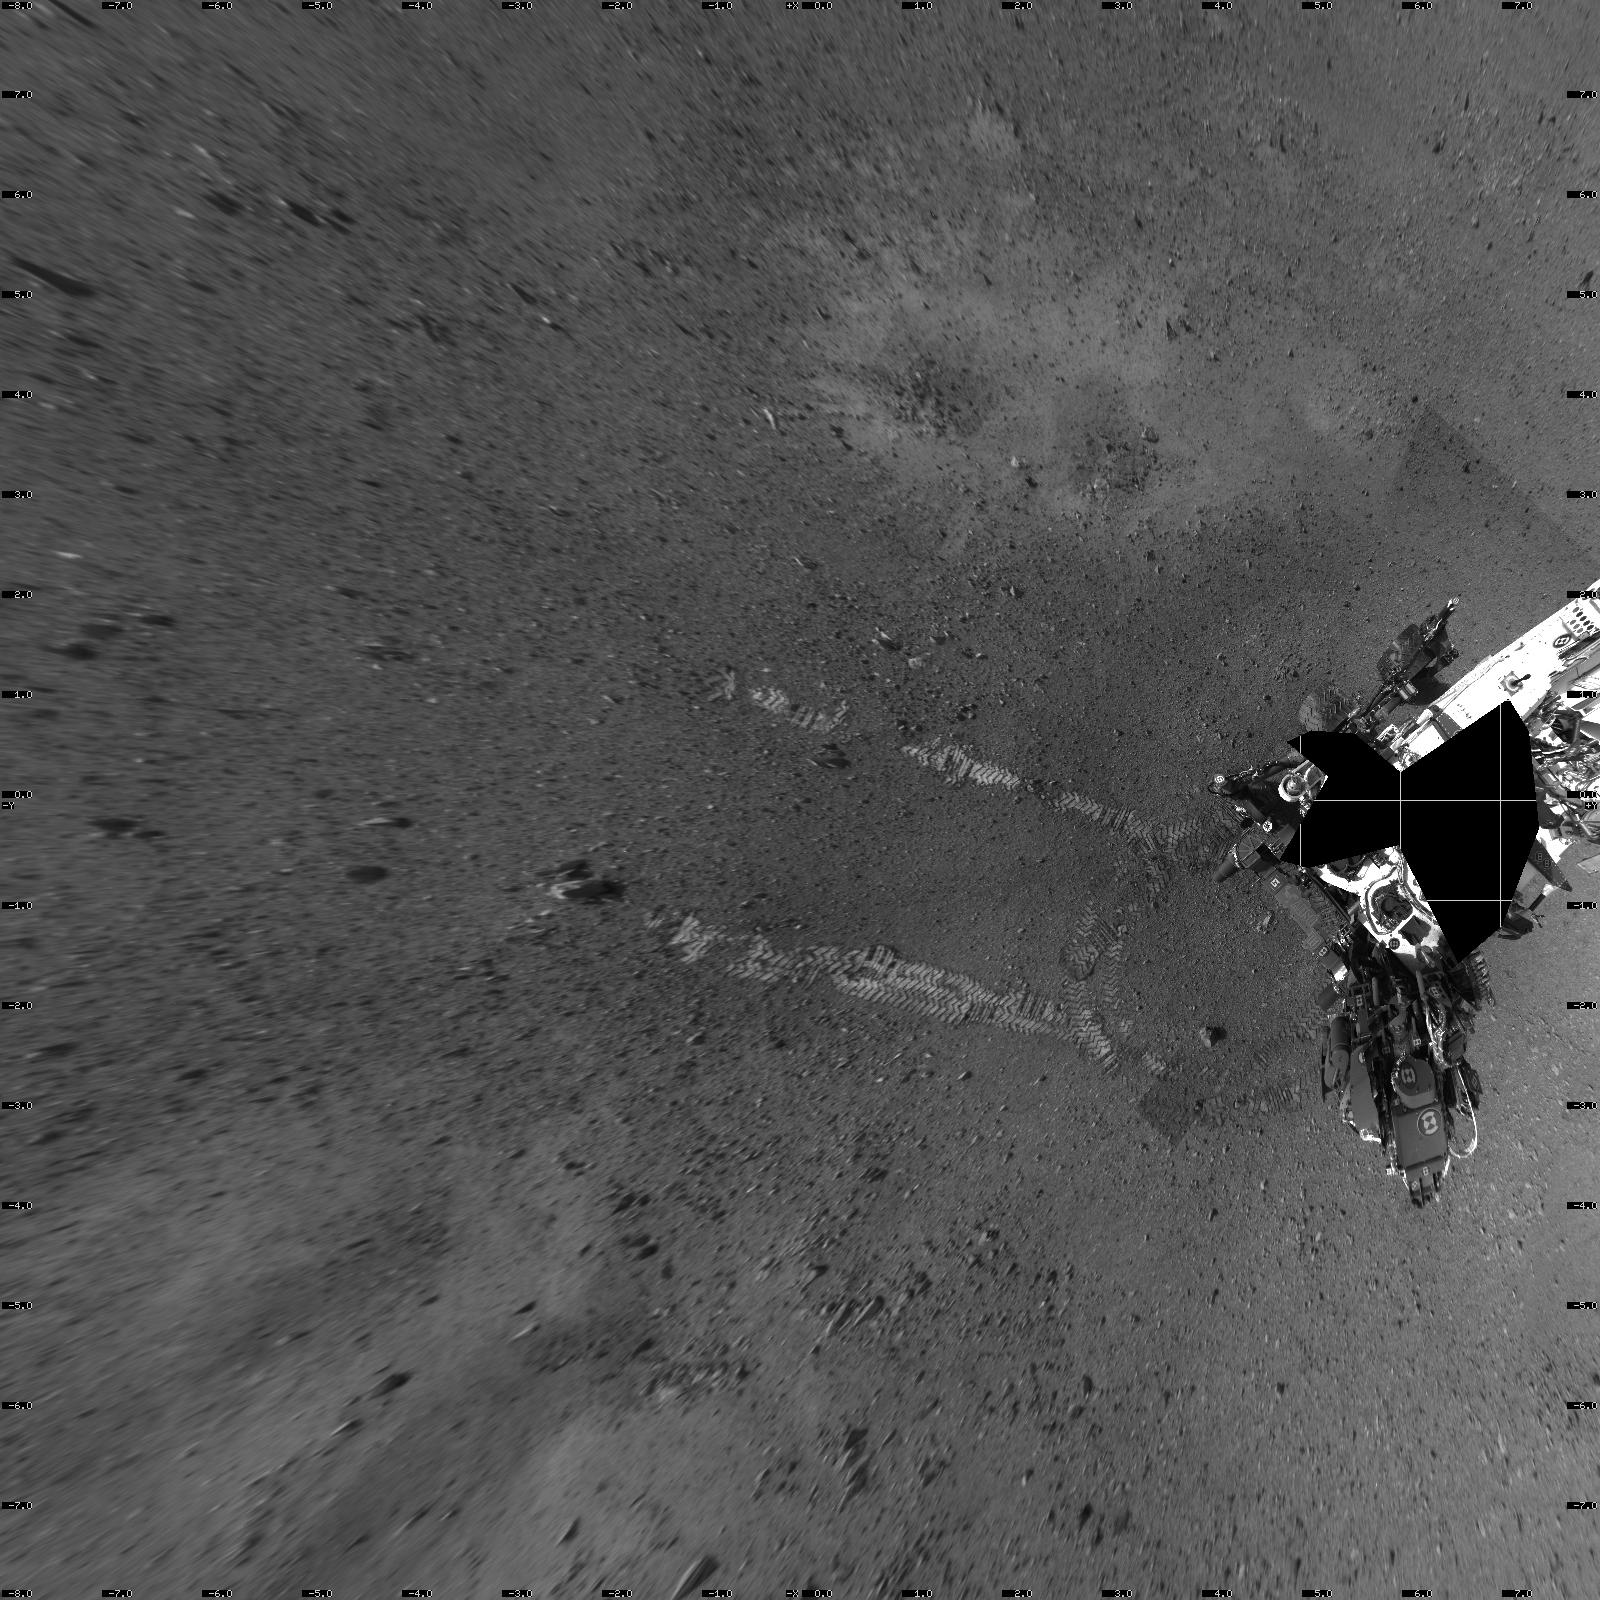 Bradbury Landing on Mars